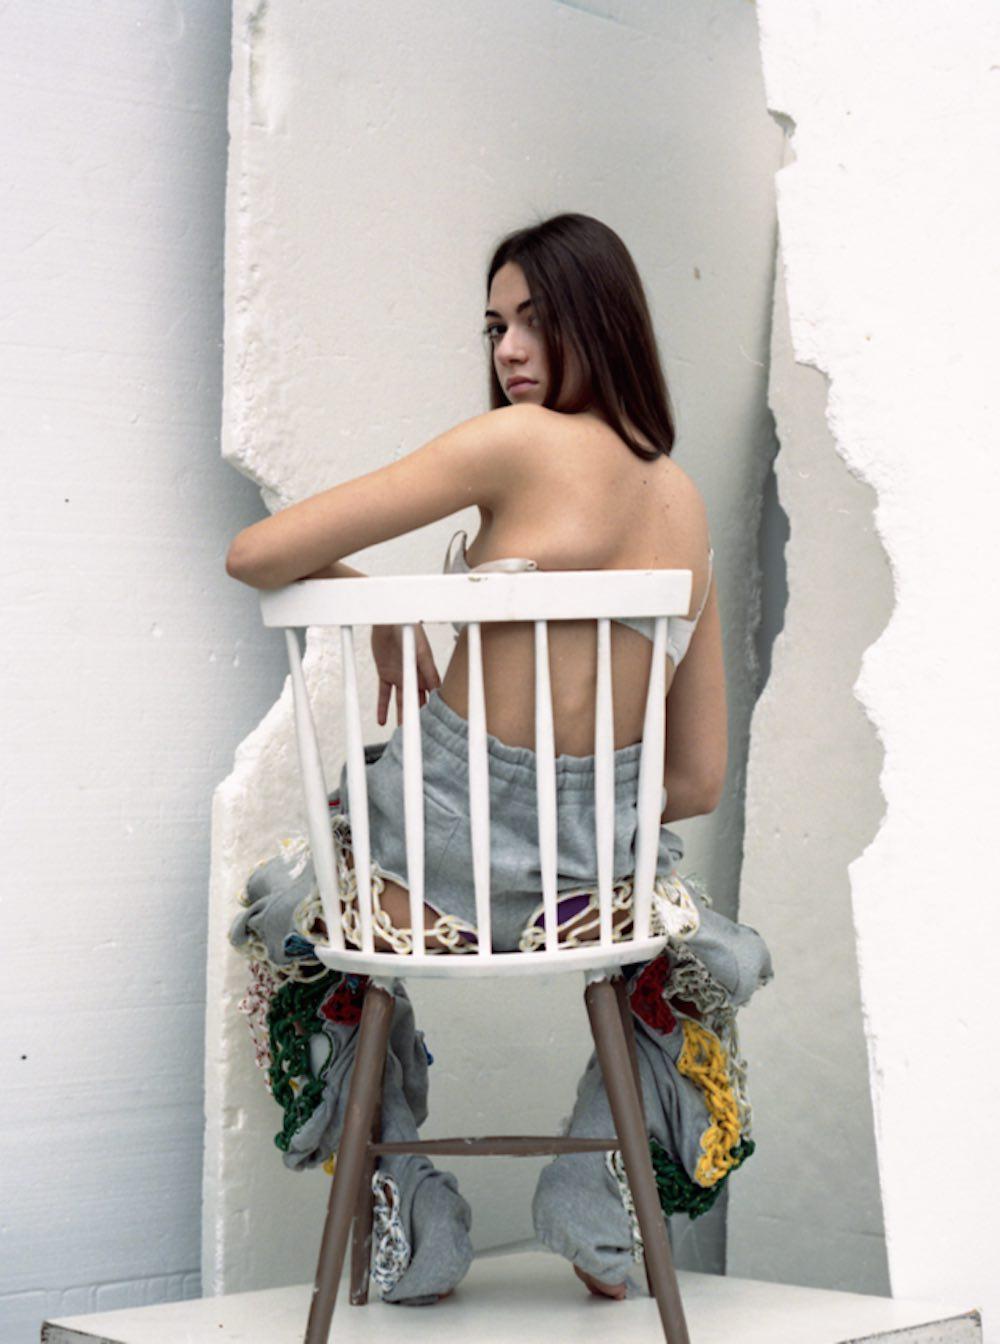 LCF BA17 work by BA (Hons) Fashion Photography student Federica Mungo.